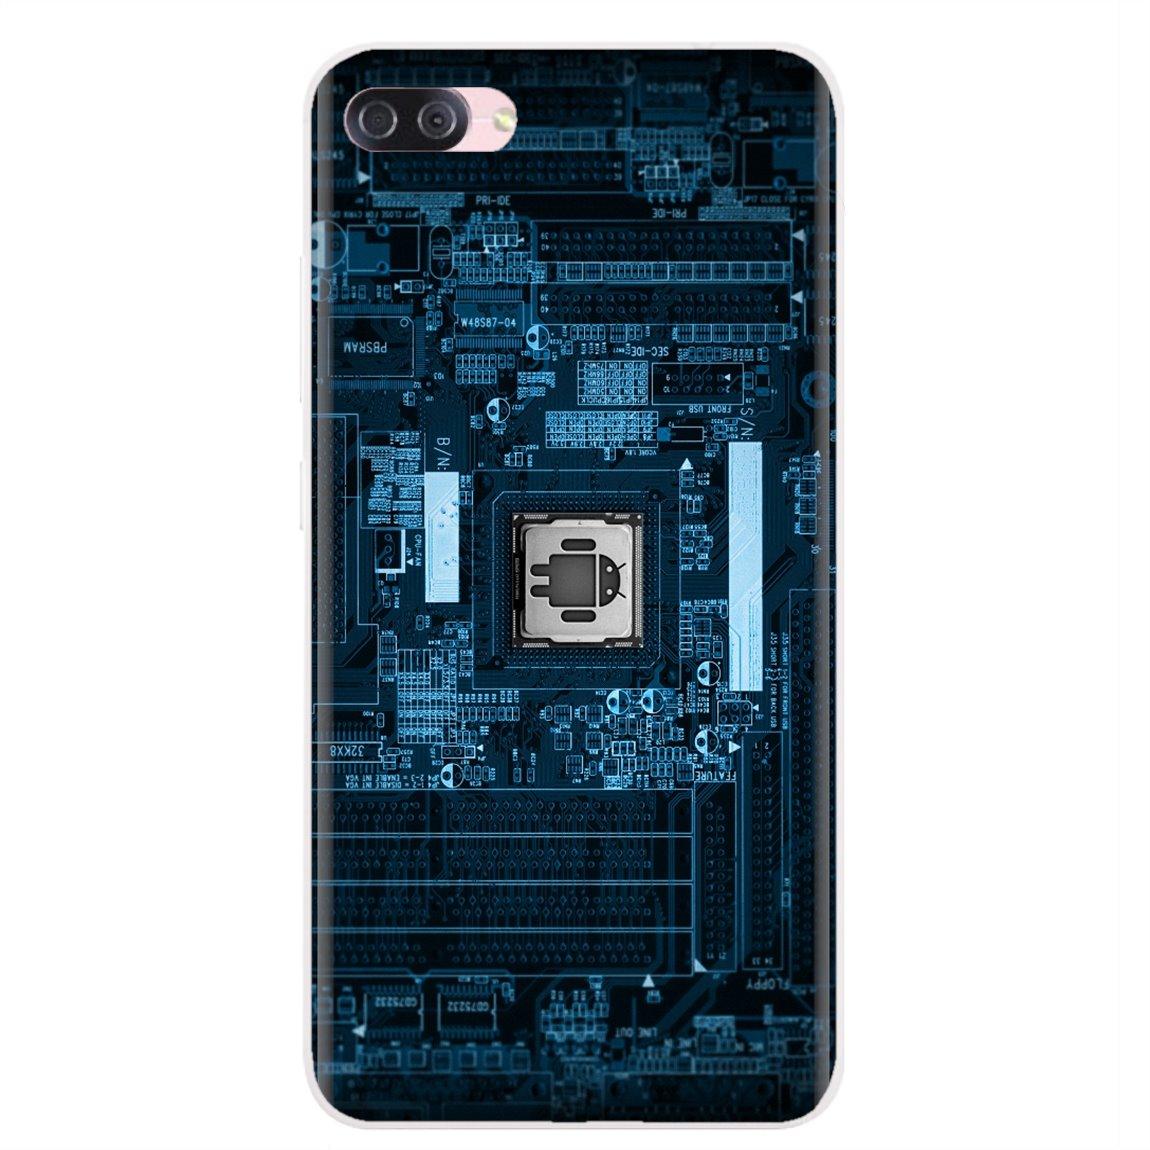 Para Xiaomi mi A1 A2 A3 5X6X8 9t Lite SE Pro mi Max MIX 1 2 3 2S buena funda de silicona para teléfono inteligente